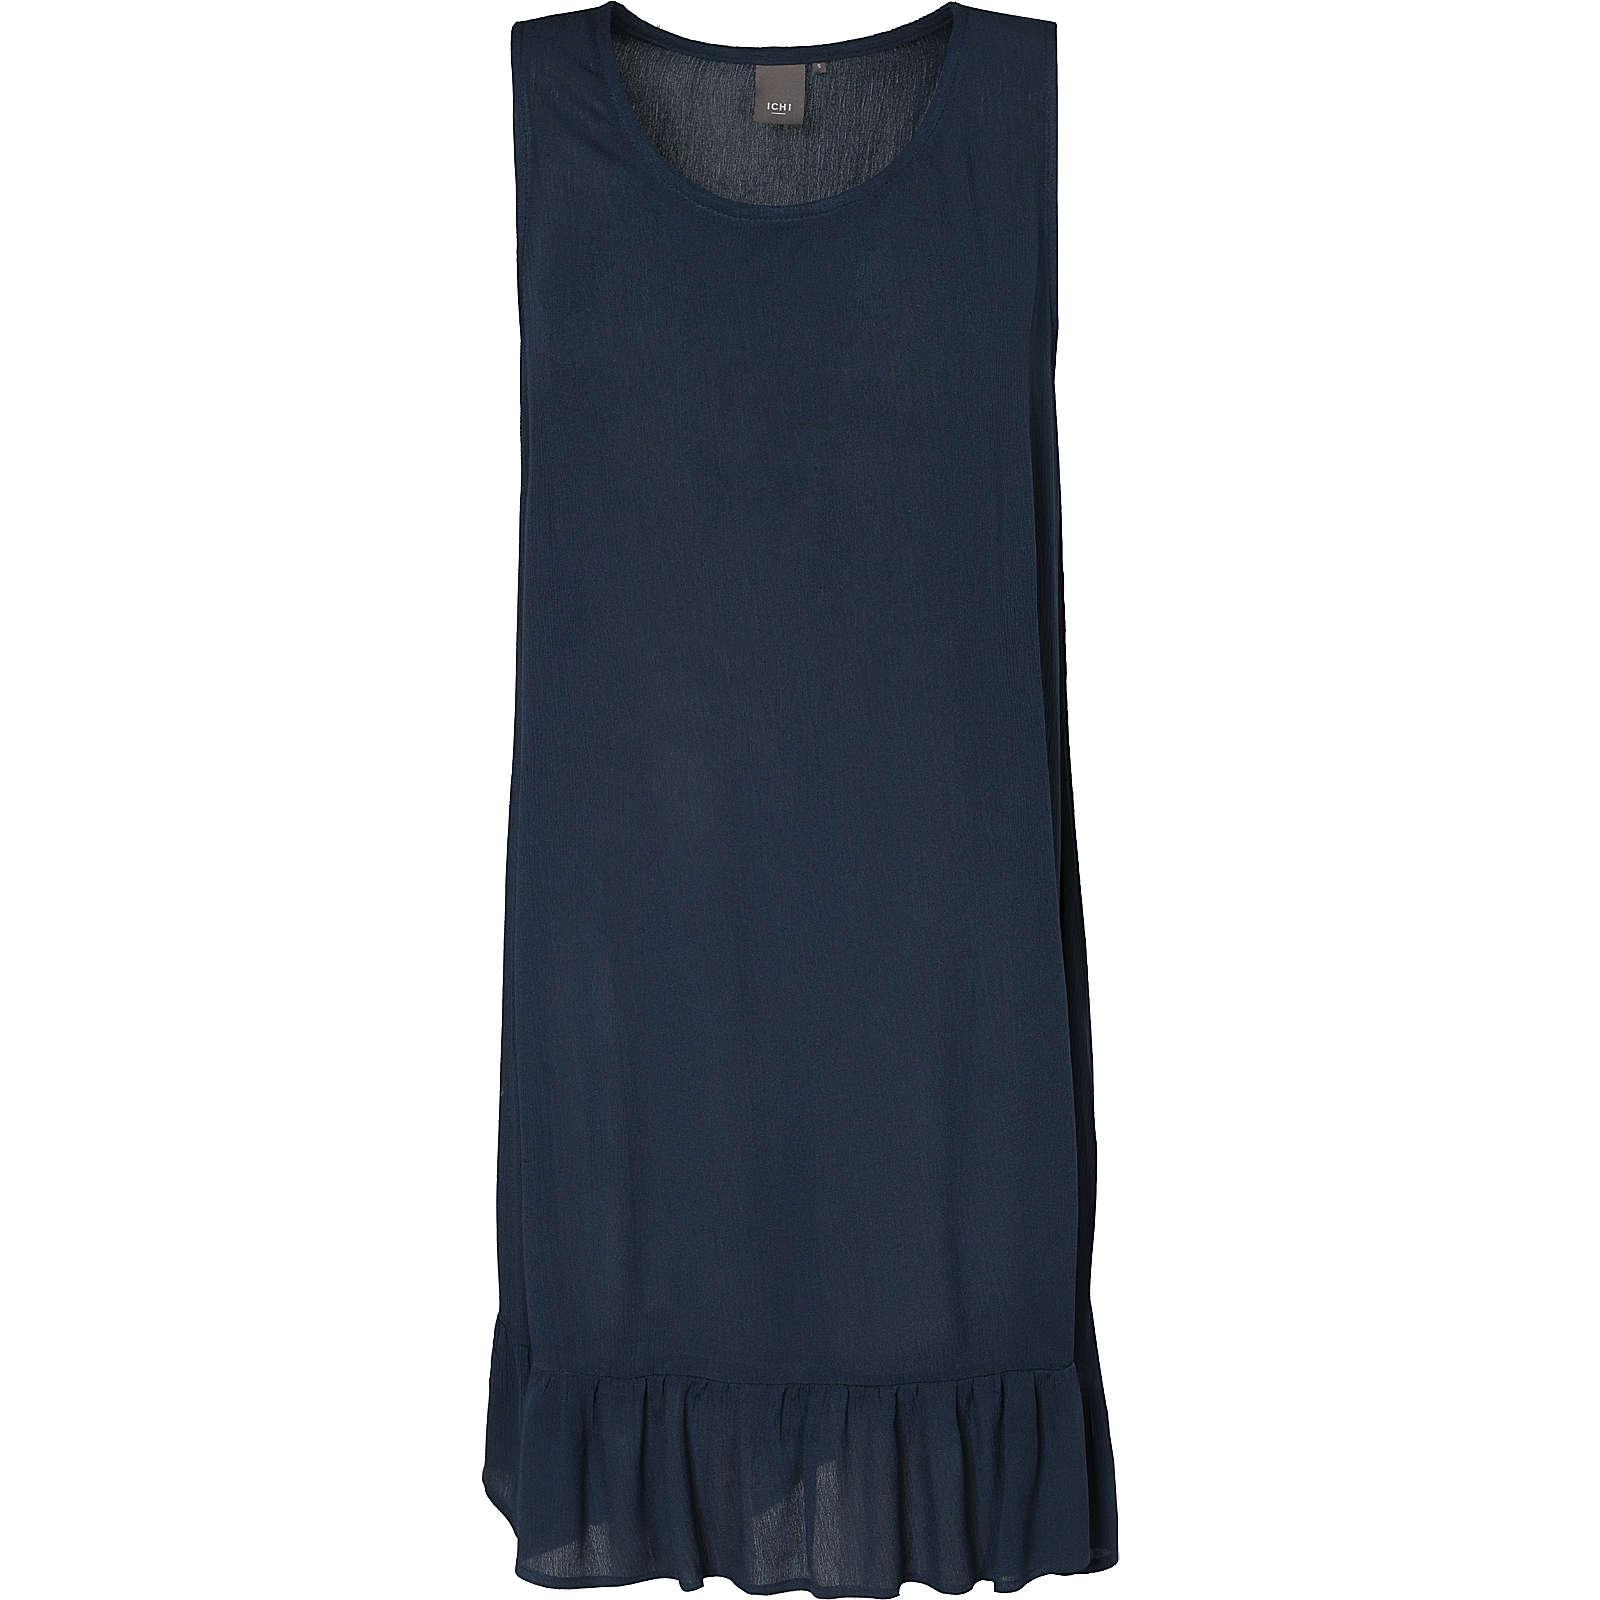 ICHI Sommerkleid Marrakech dunkelblau Damen Gr. 40